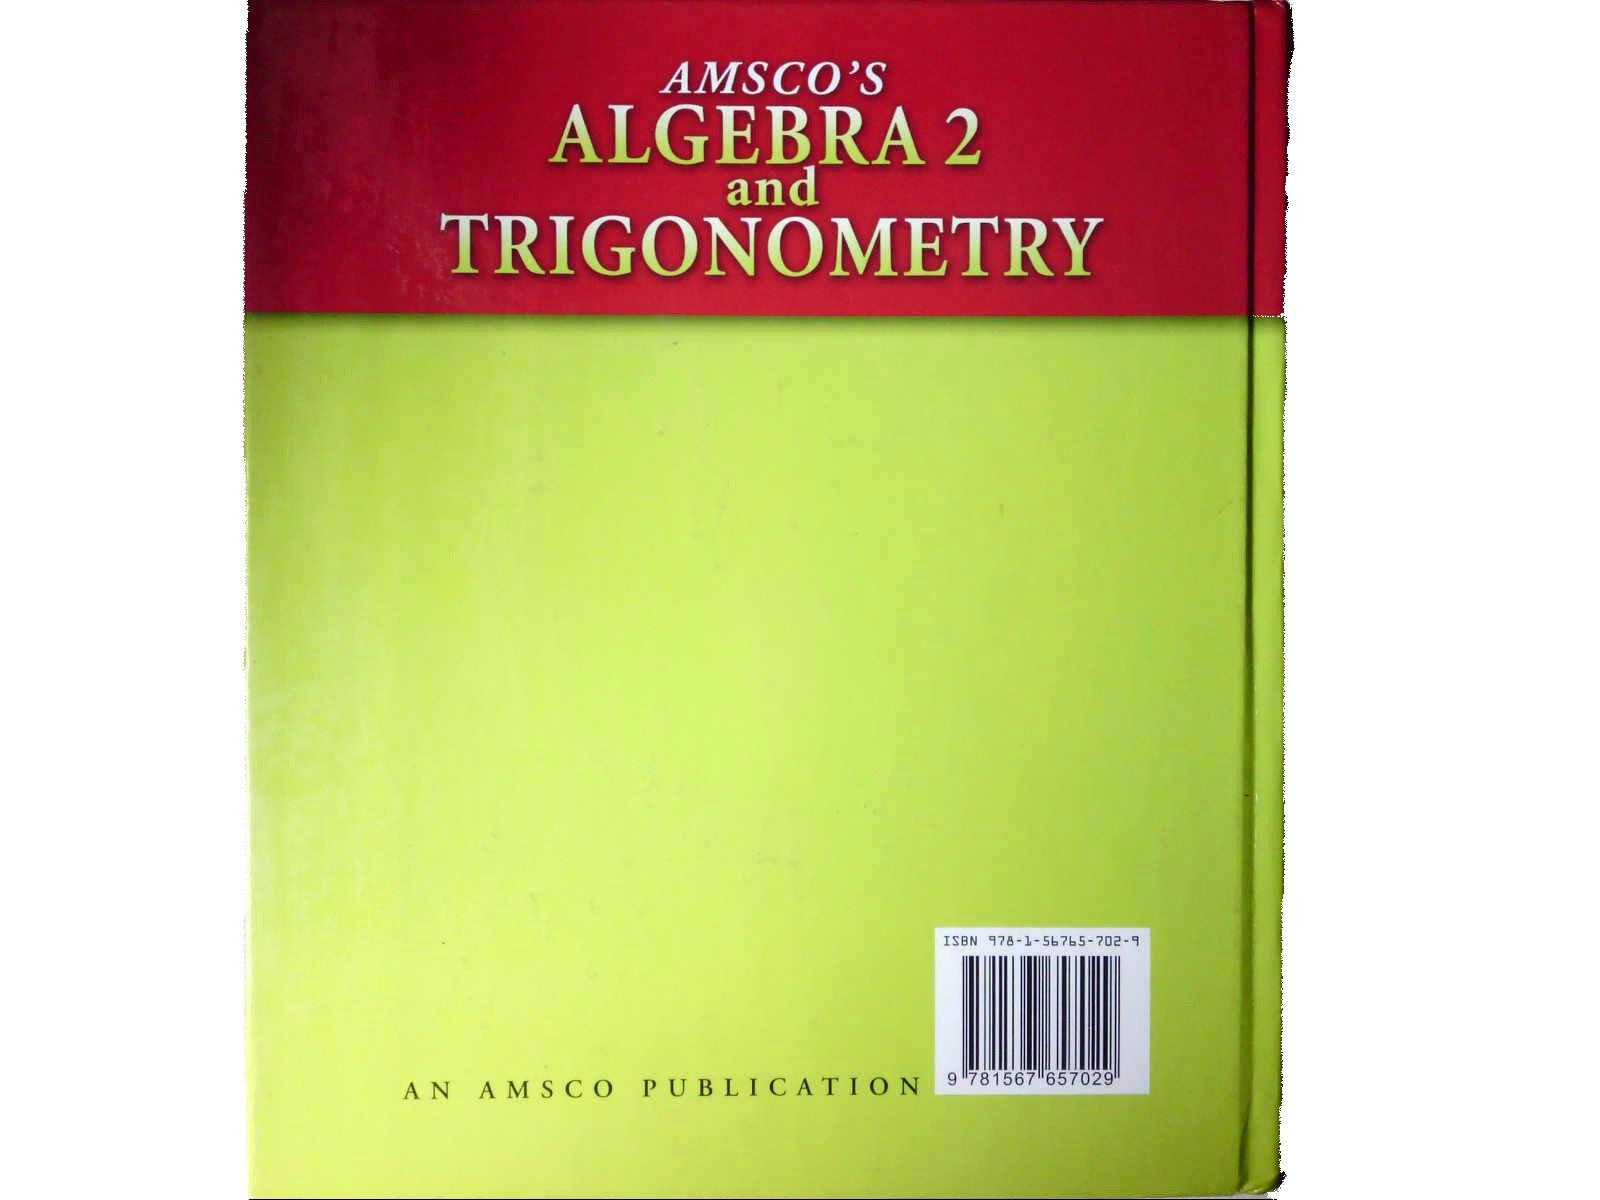 Amsco S Algebra 2 And Trigonometry Gantert 9781567657029 Amazon